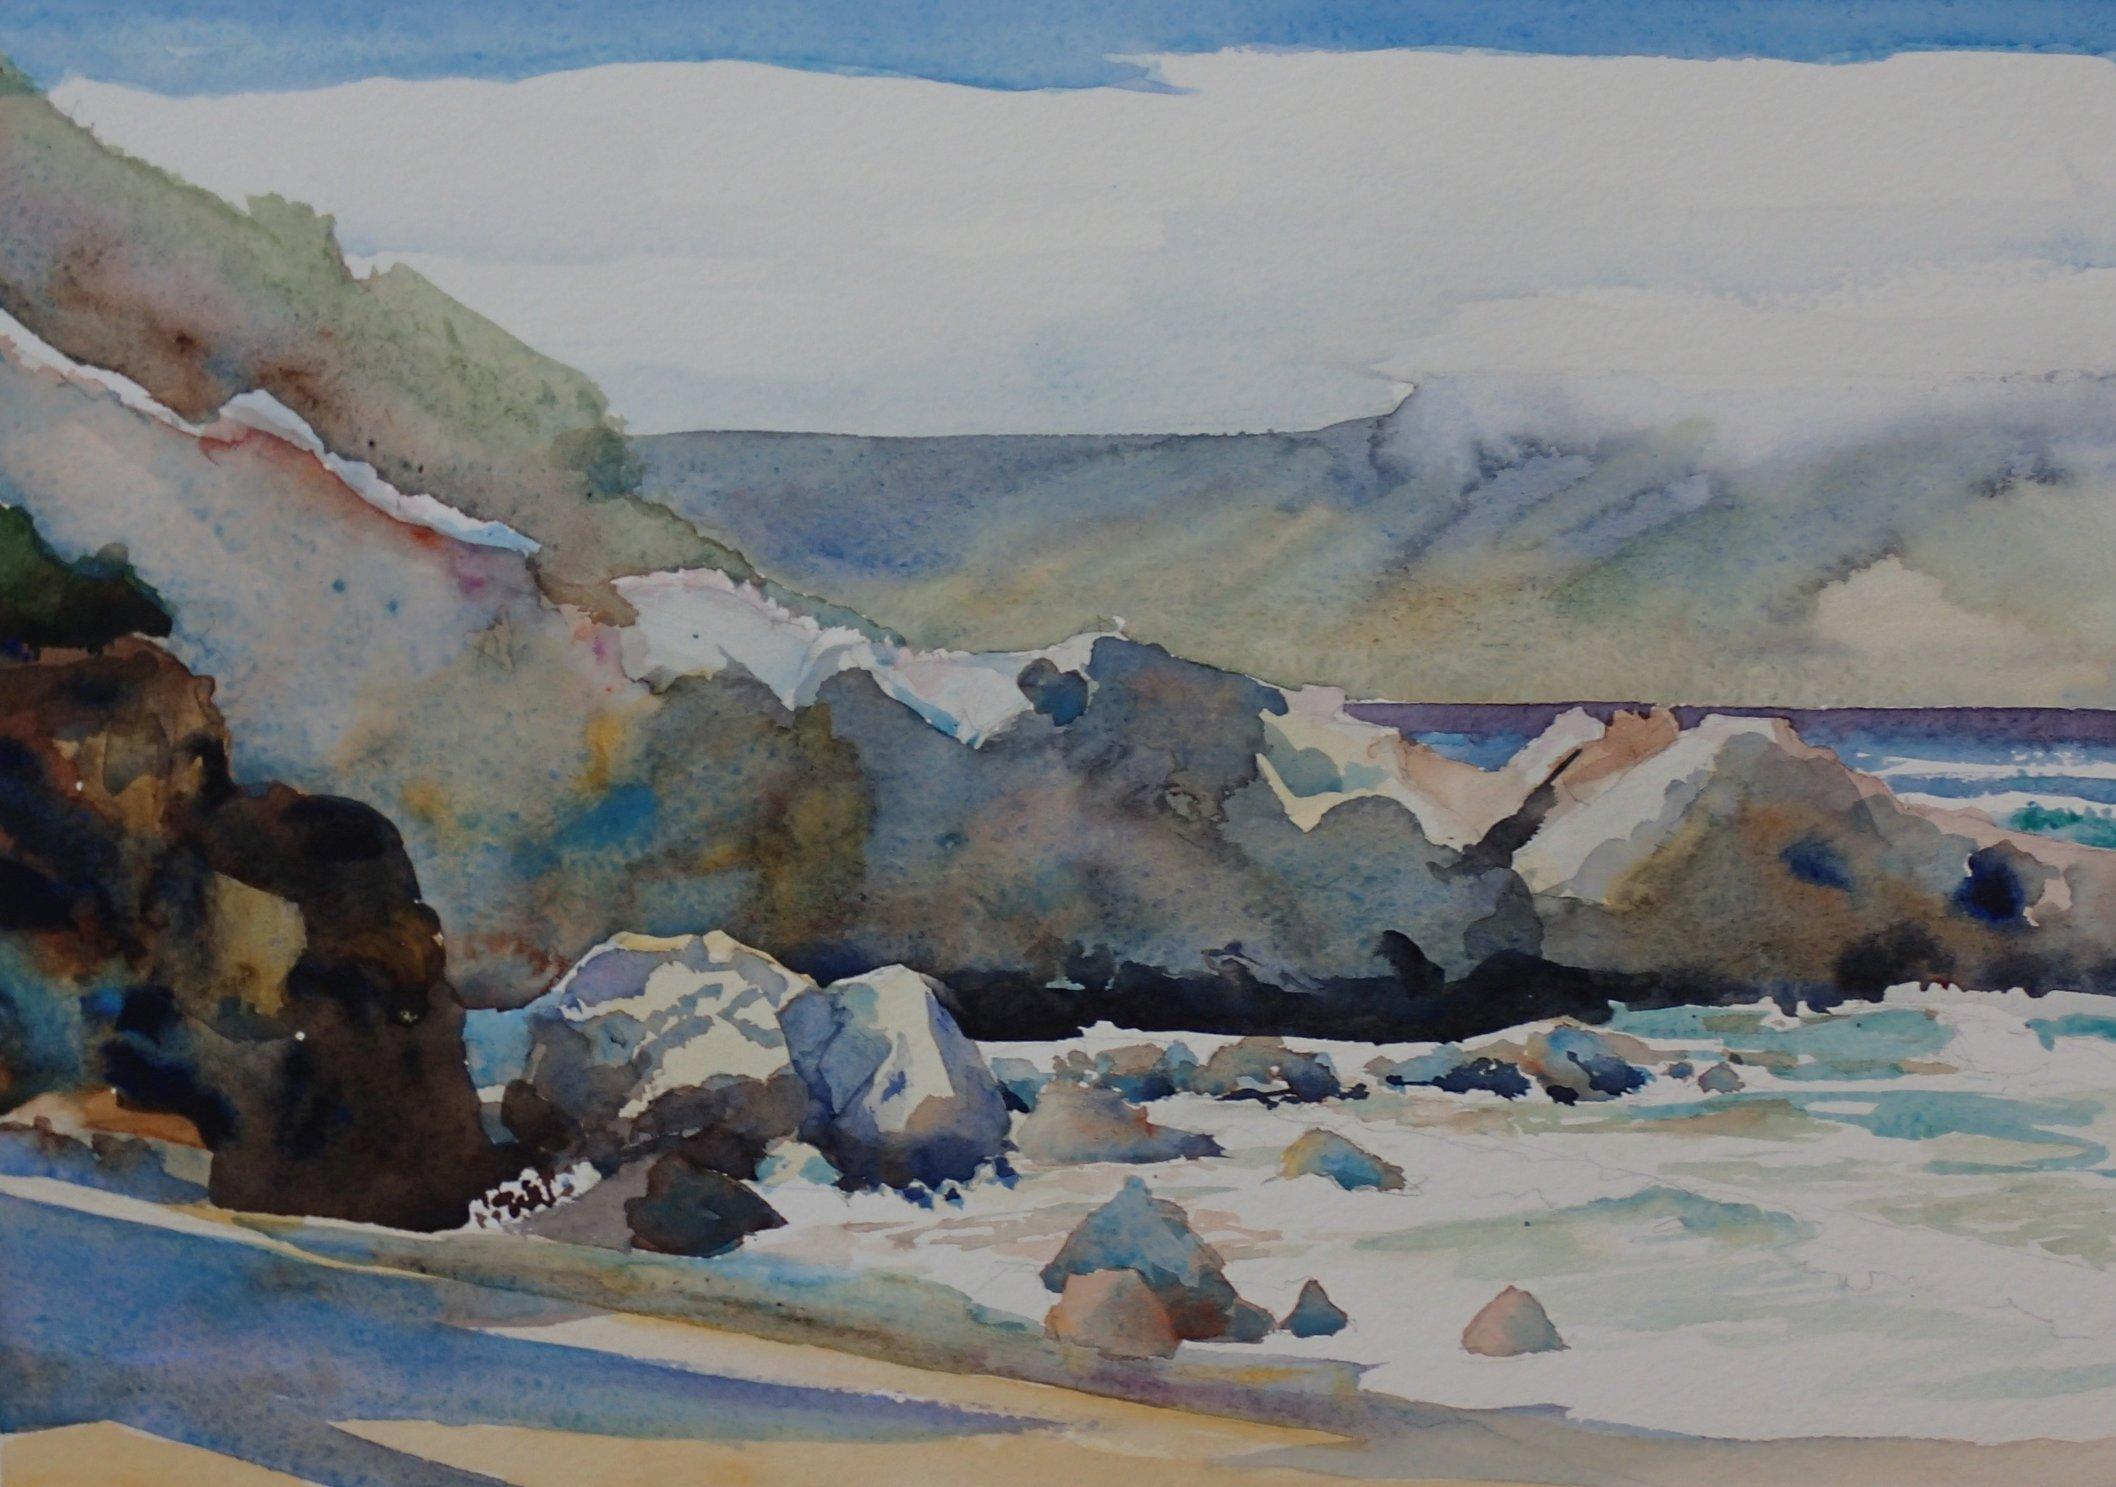 Slaughterhouse Beach Rocks